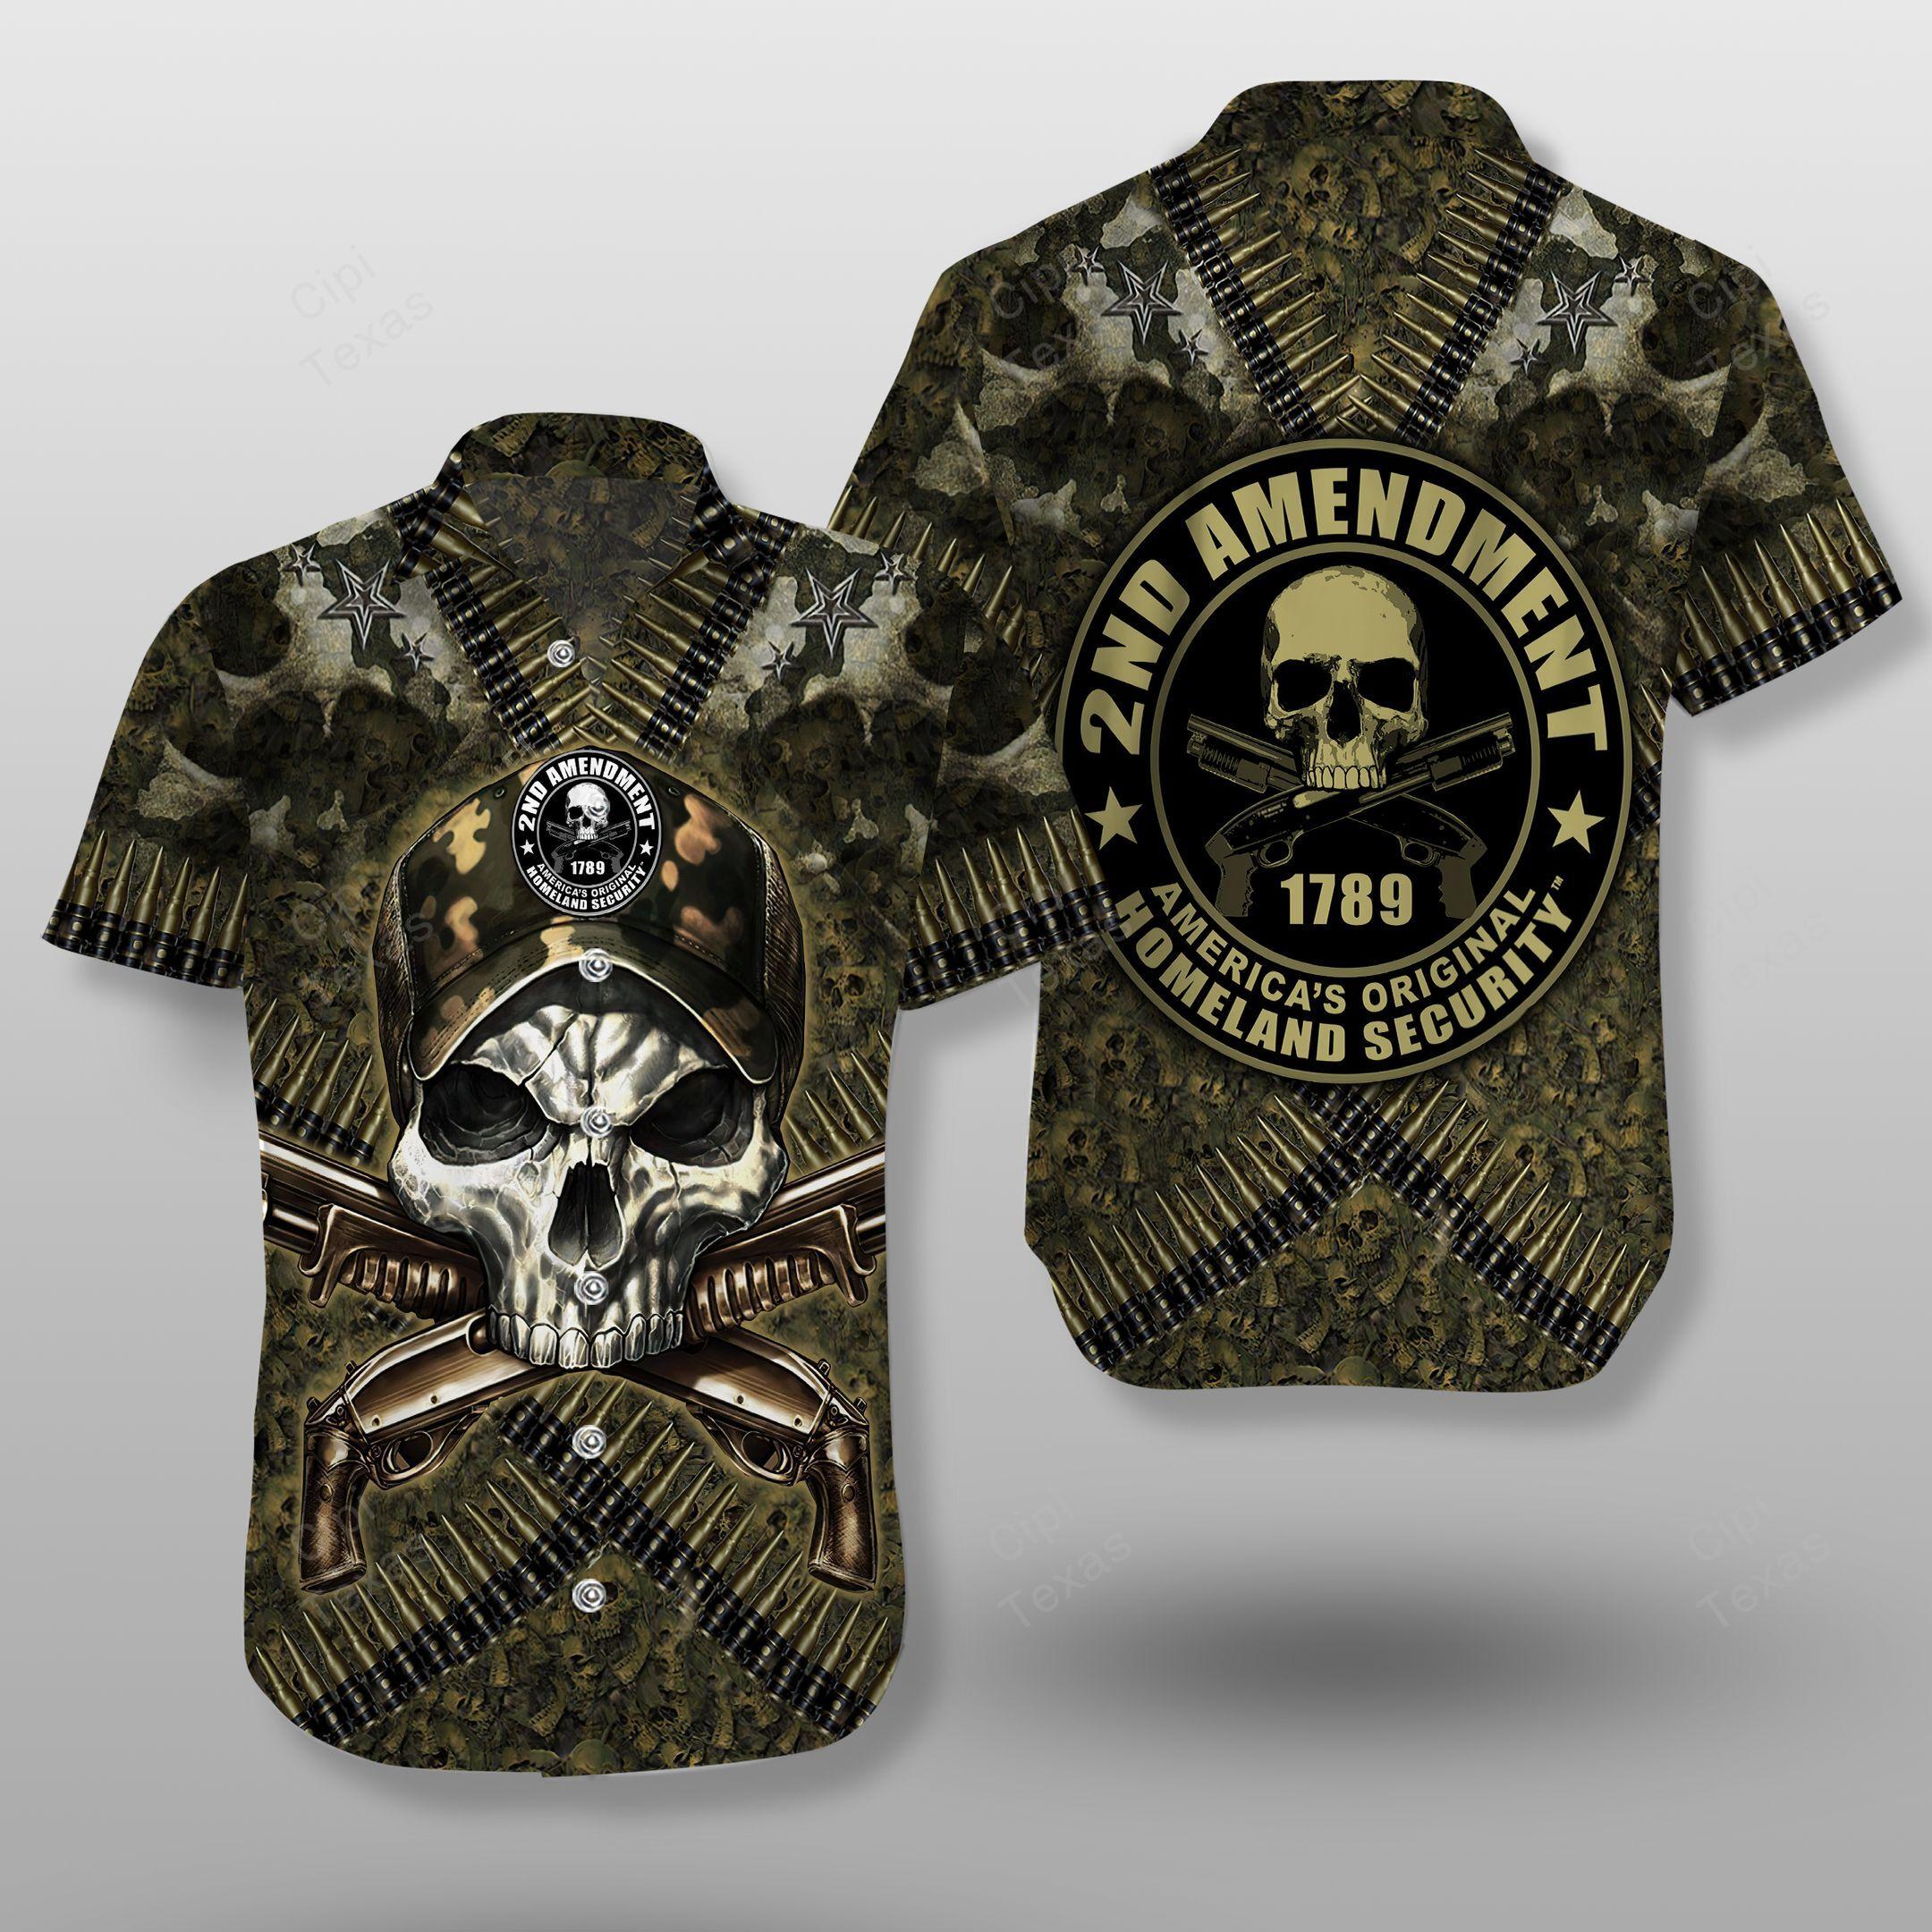 Original Home Land Security 2nd Amendment Skull America Hawaiian Shirt